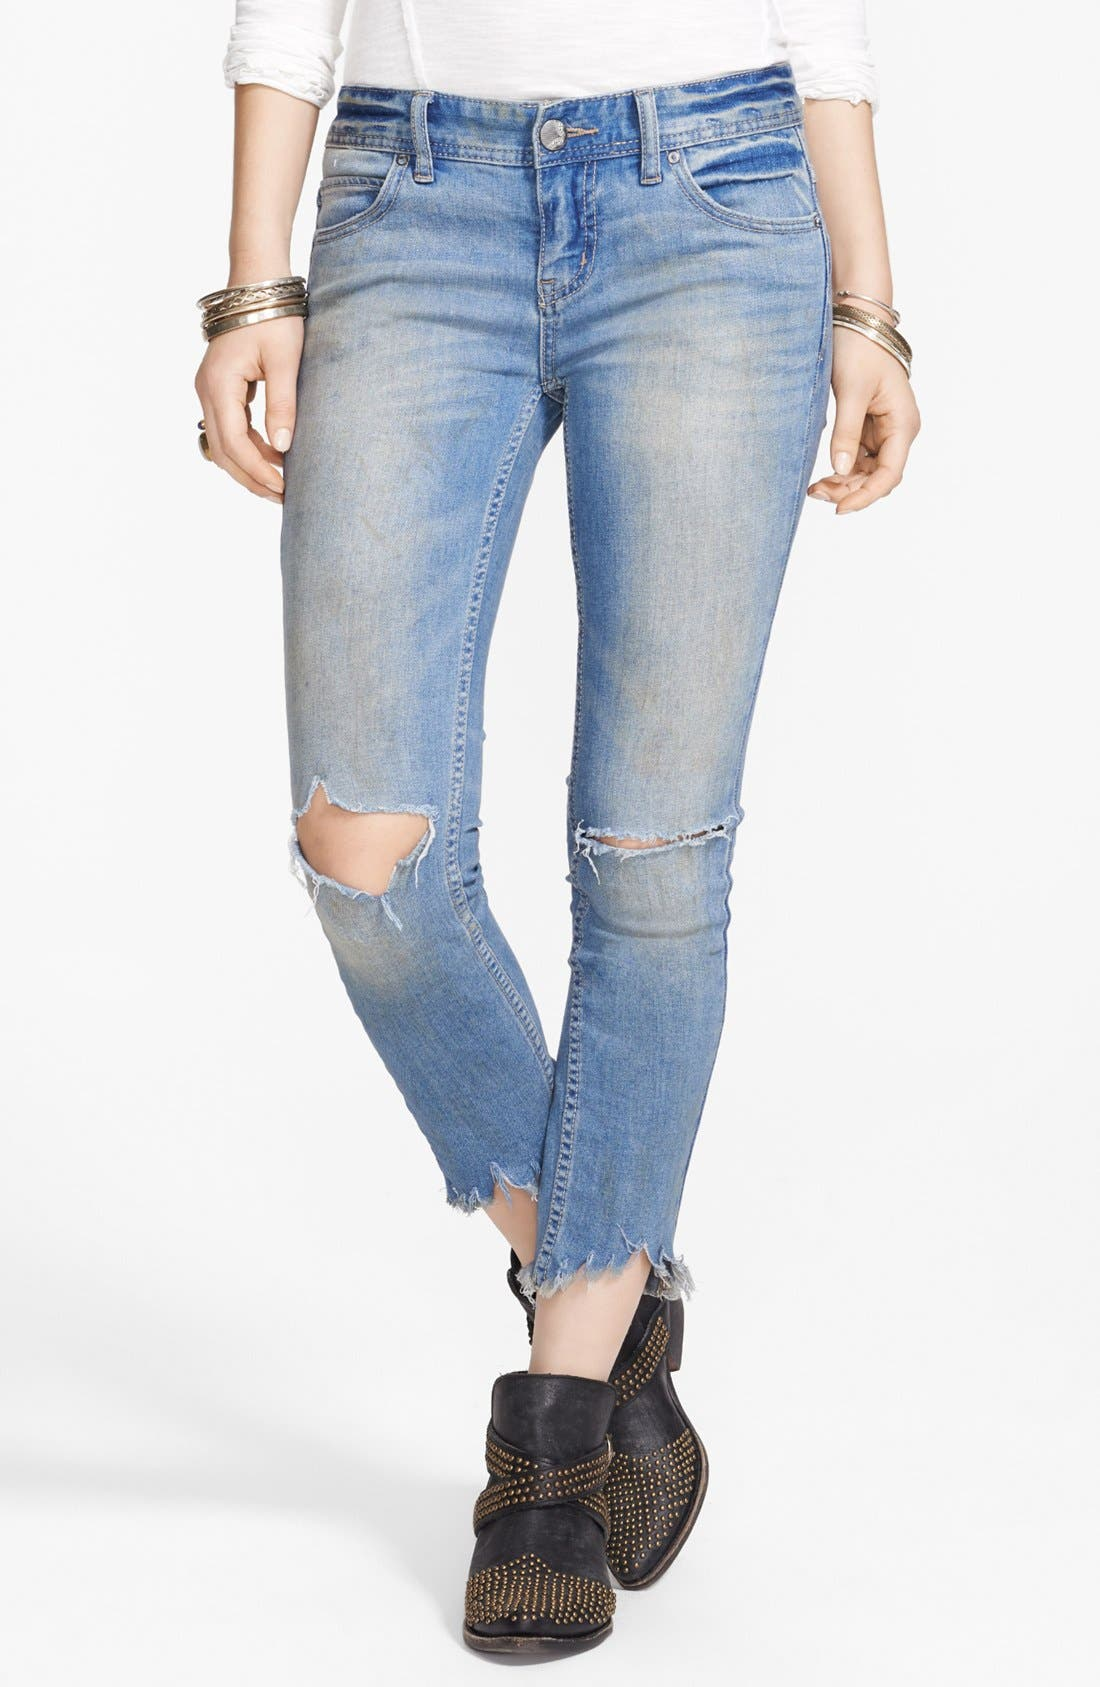 Alternate Image 1 Selected - Free People Destroyed Skinny Ankle Jeans (Engineered Wash)